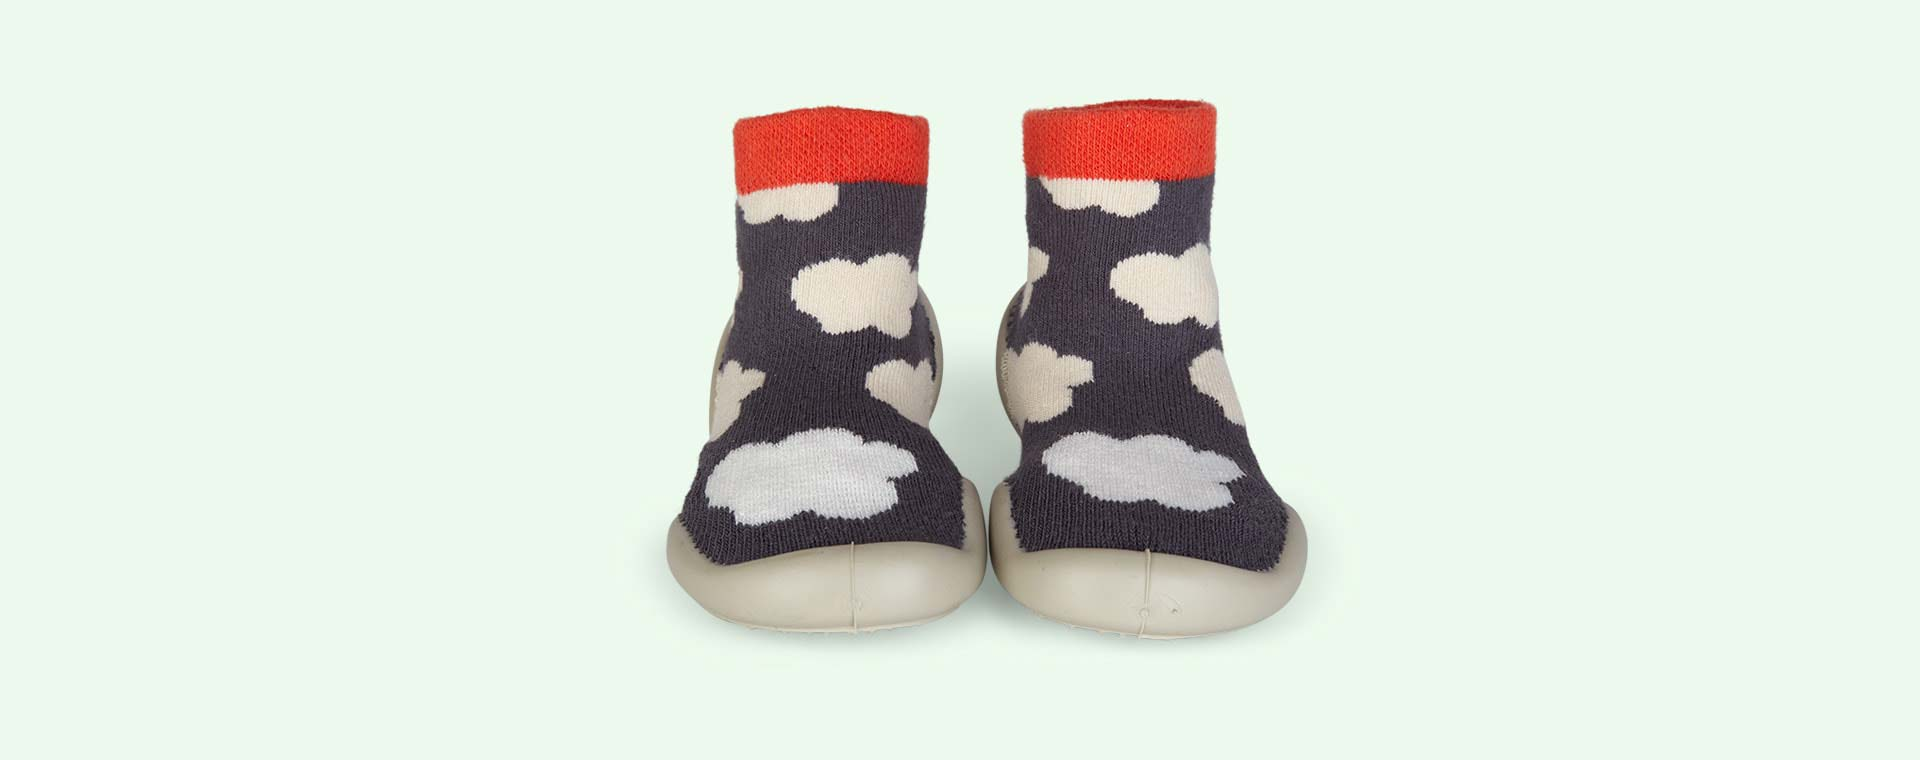 Grey Collegien Glow In The Dark Cloud Slipper Socks